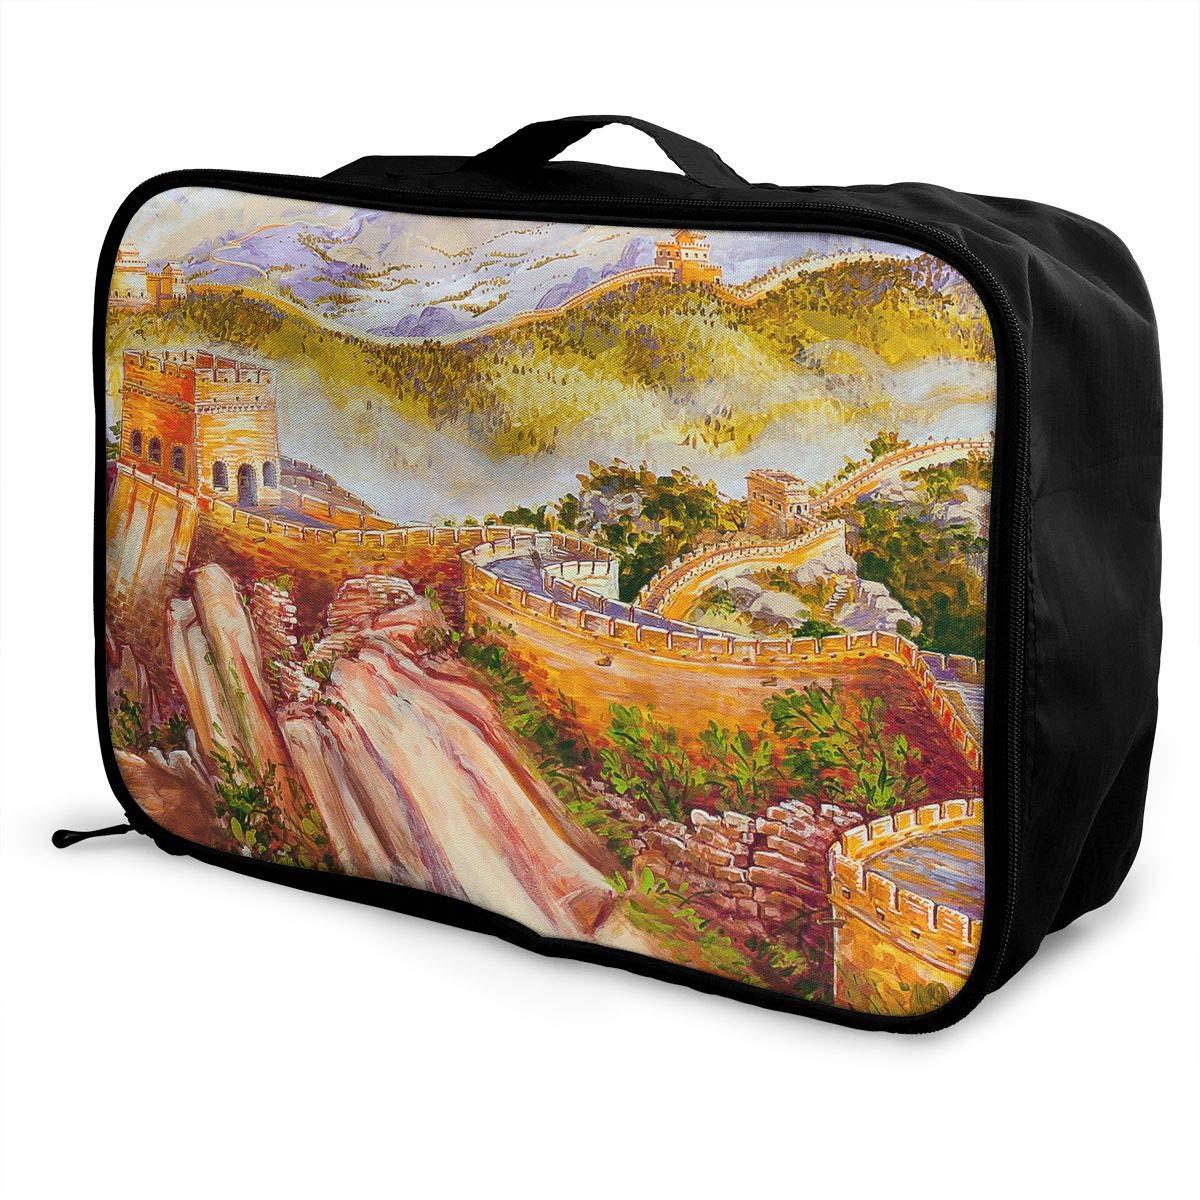 Travel Luggage Duffle Bag Lightweight Portable Handbag Fantasy Great Wall Large Capacity Waterproof Foldable Storage Tote